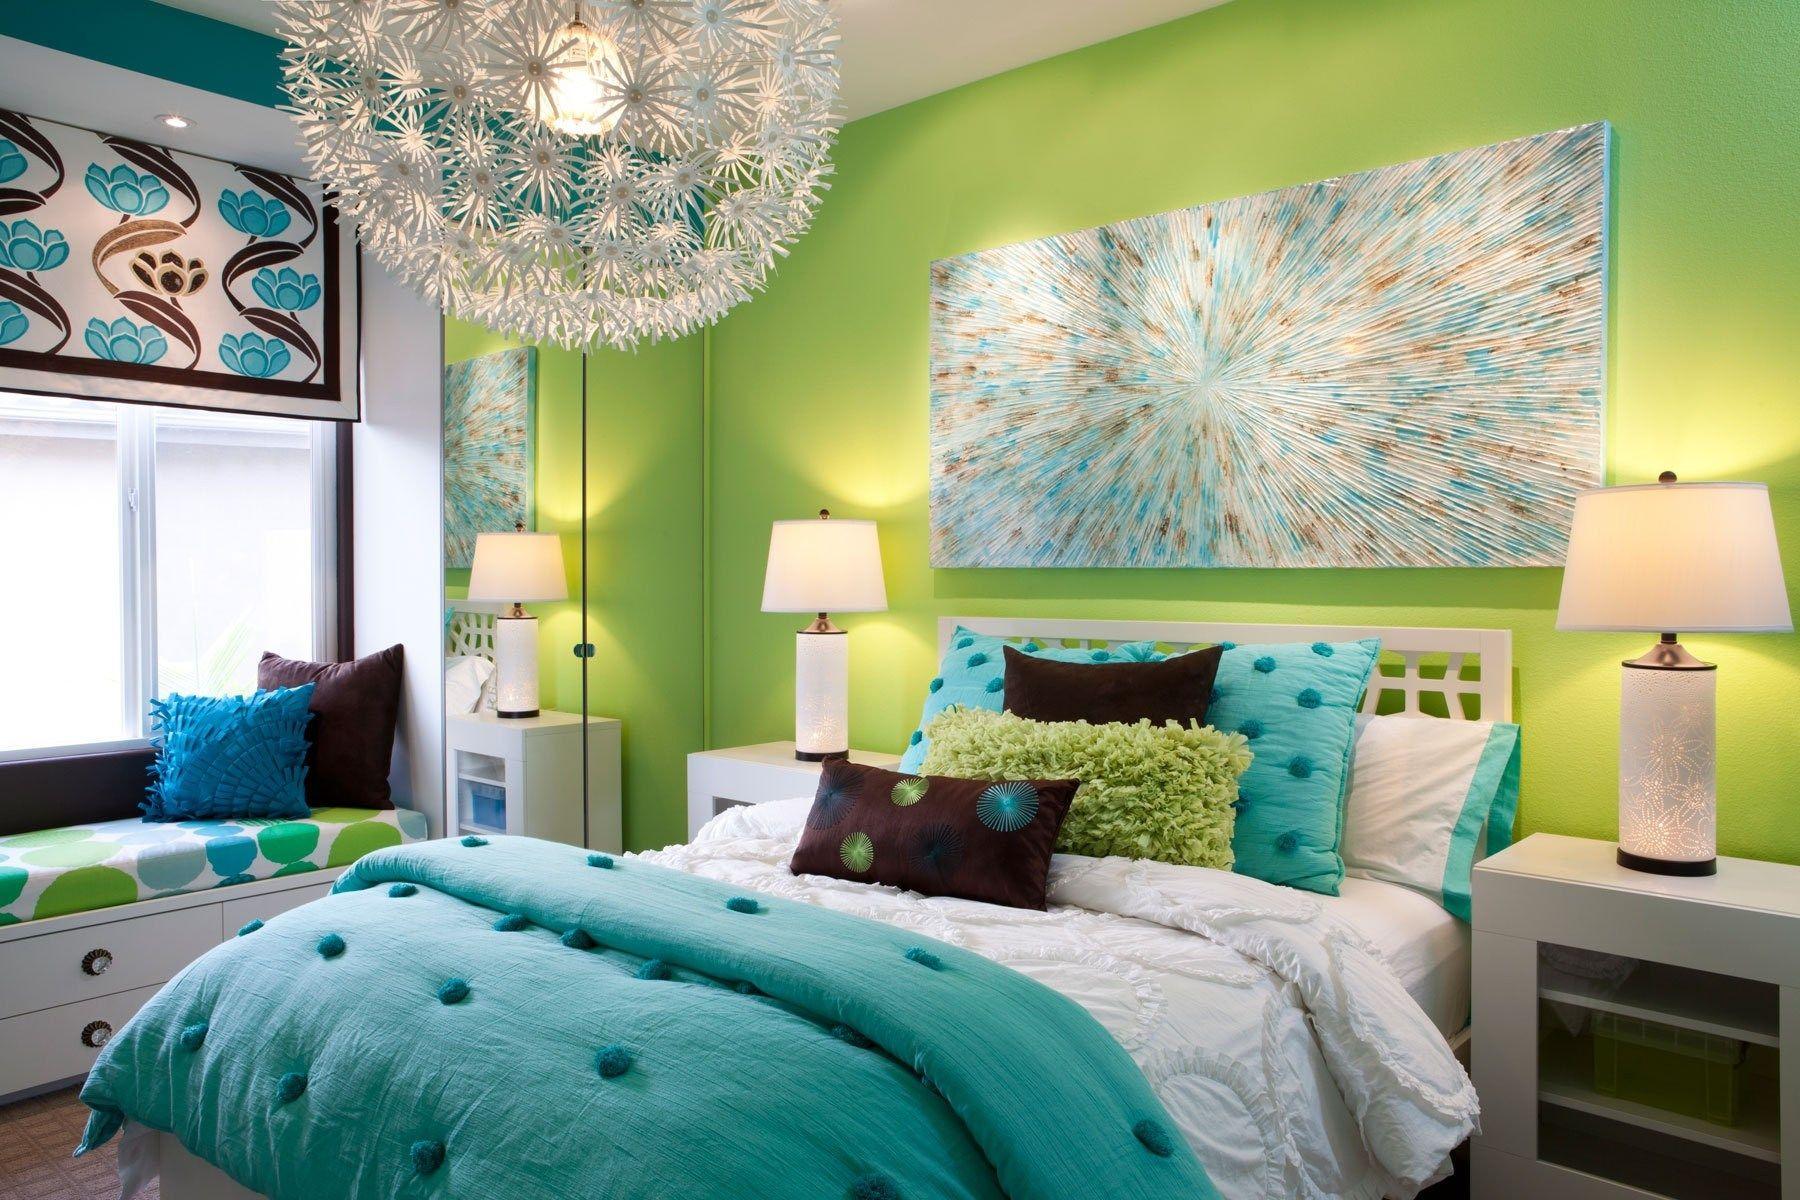 105 Harga Wallpaper Dinding Kamar Tidur Warna Biru